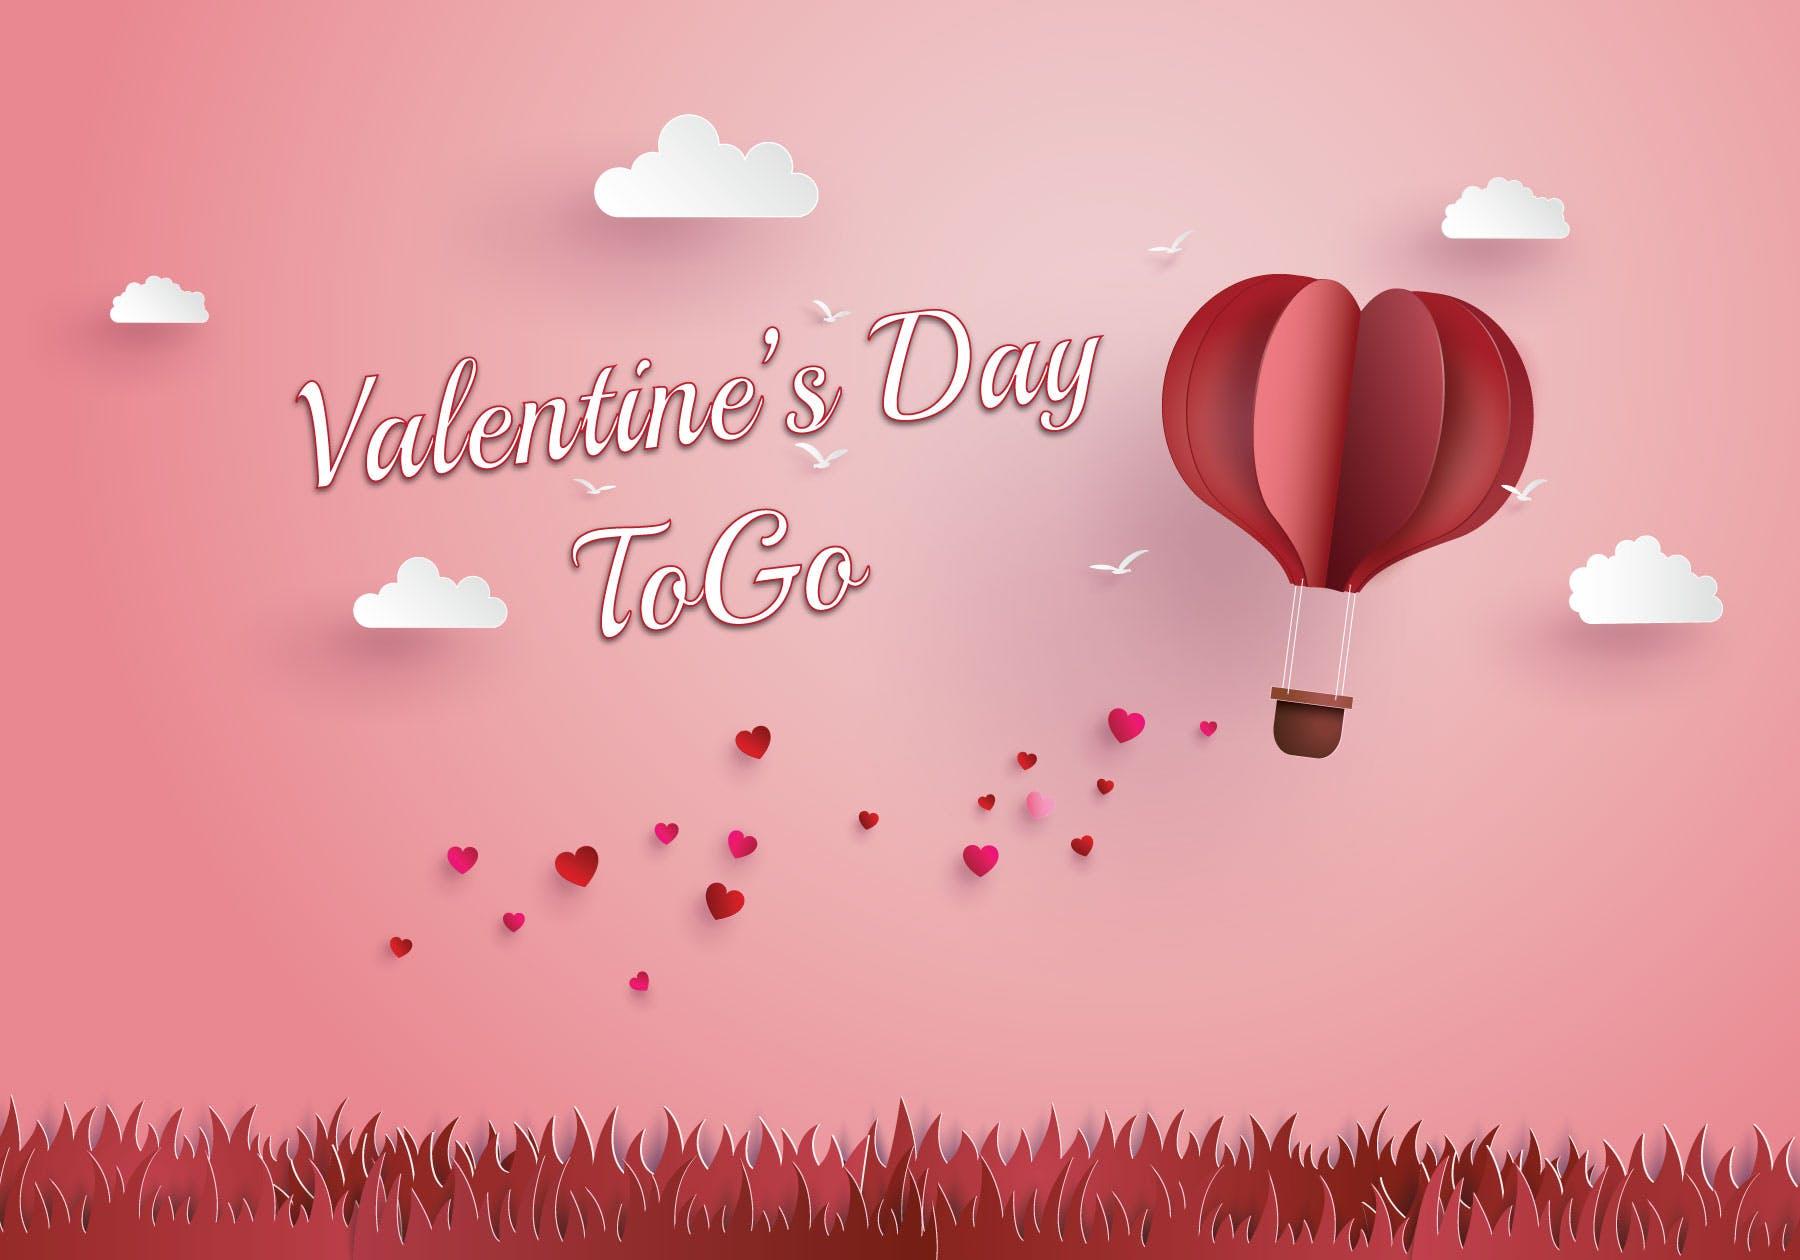 Valentine's ToGo Dinner image